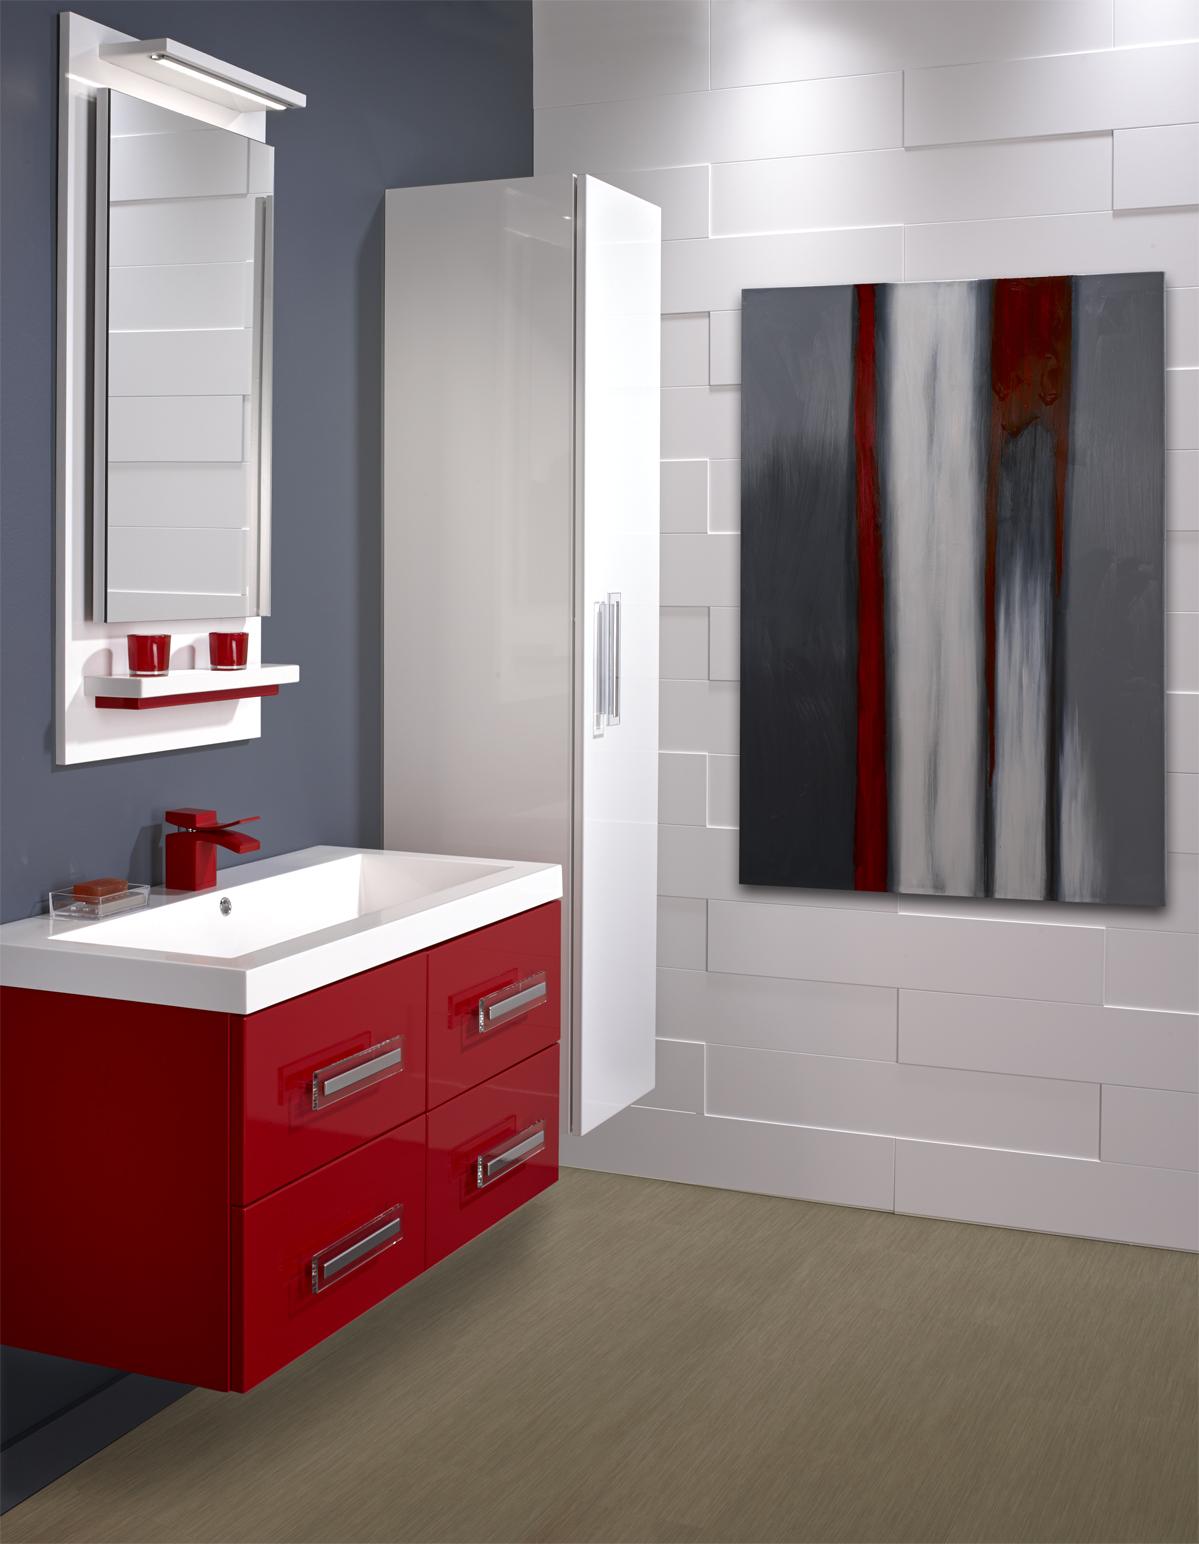 Salle De Bain Rouge Et Blanc inspiration blanc | murdesign